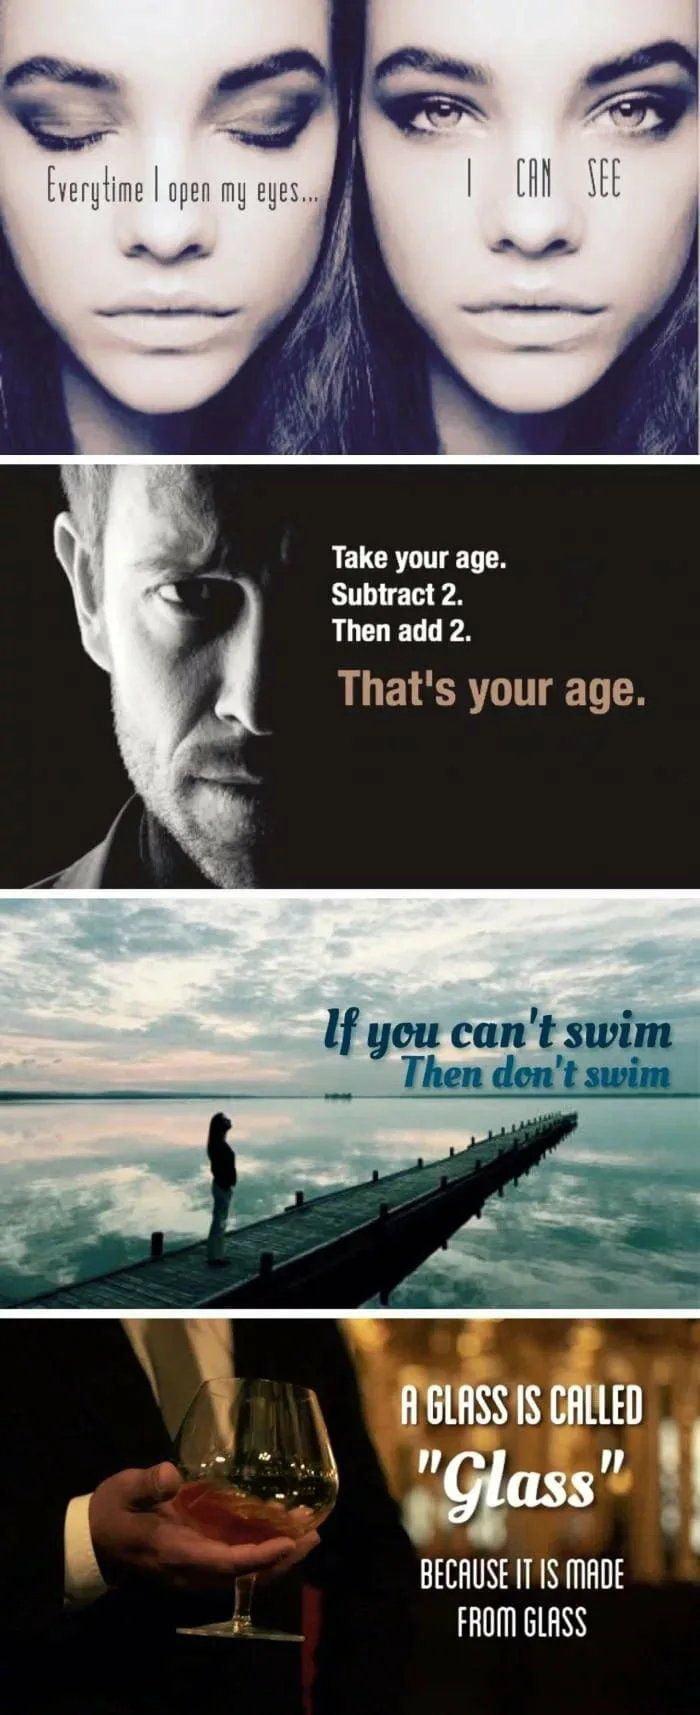 Inspiring, don't you think?